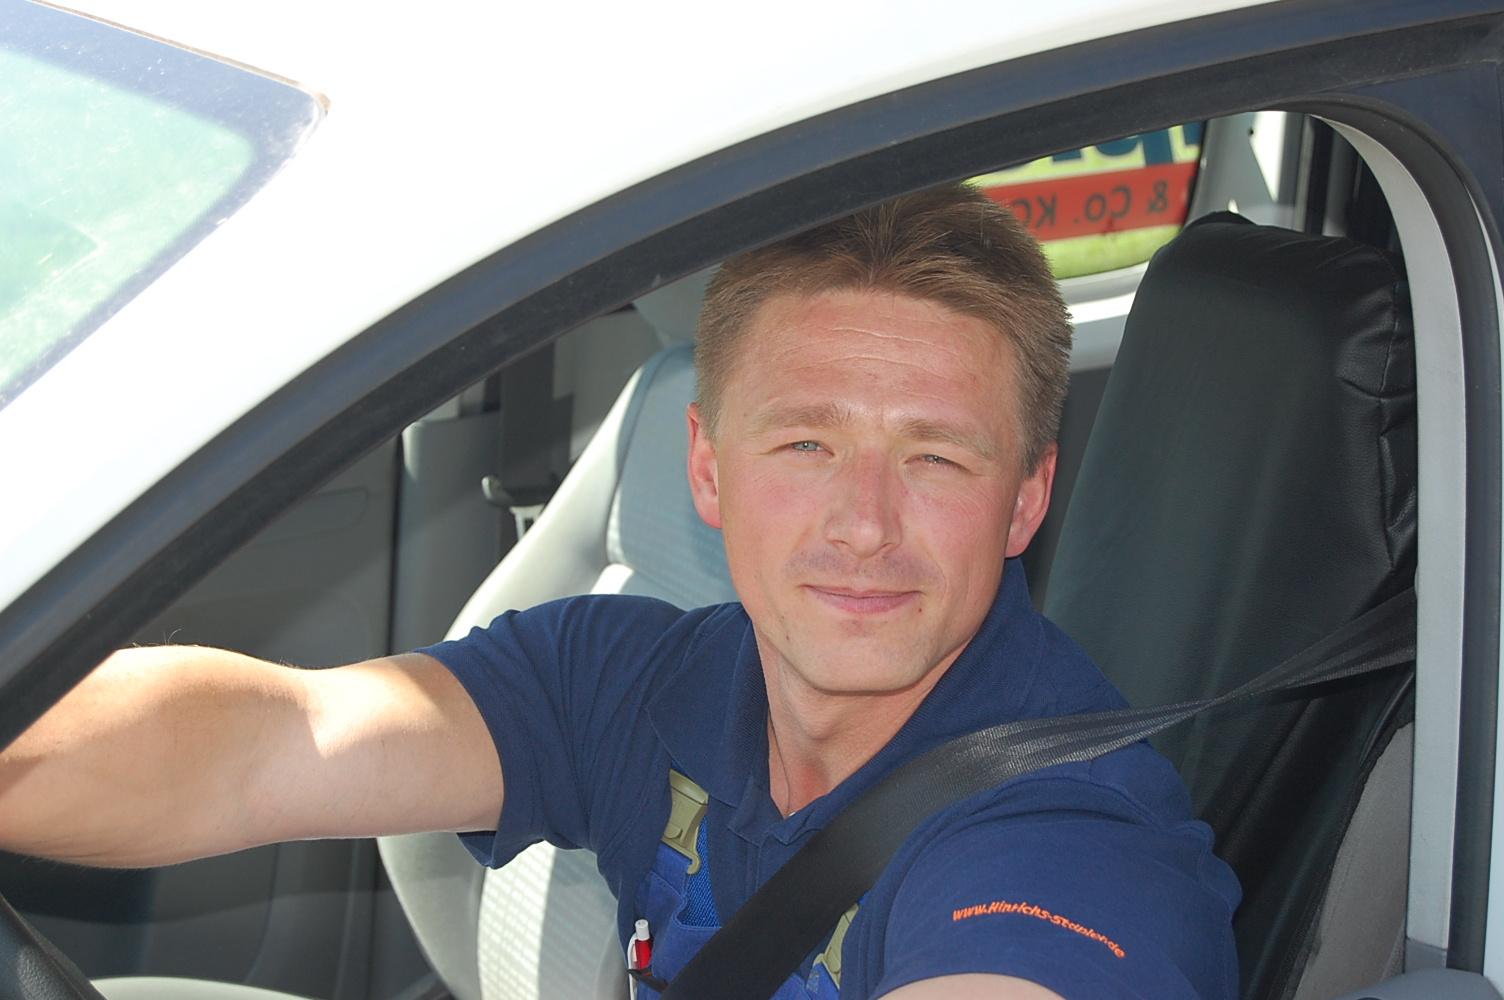 Peter Kriger - Hinrichs Forklift & Reachstacker - www.hinrichs-forklifts.com